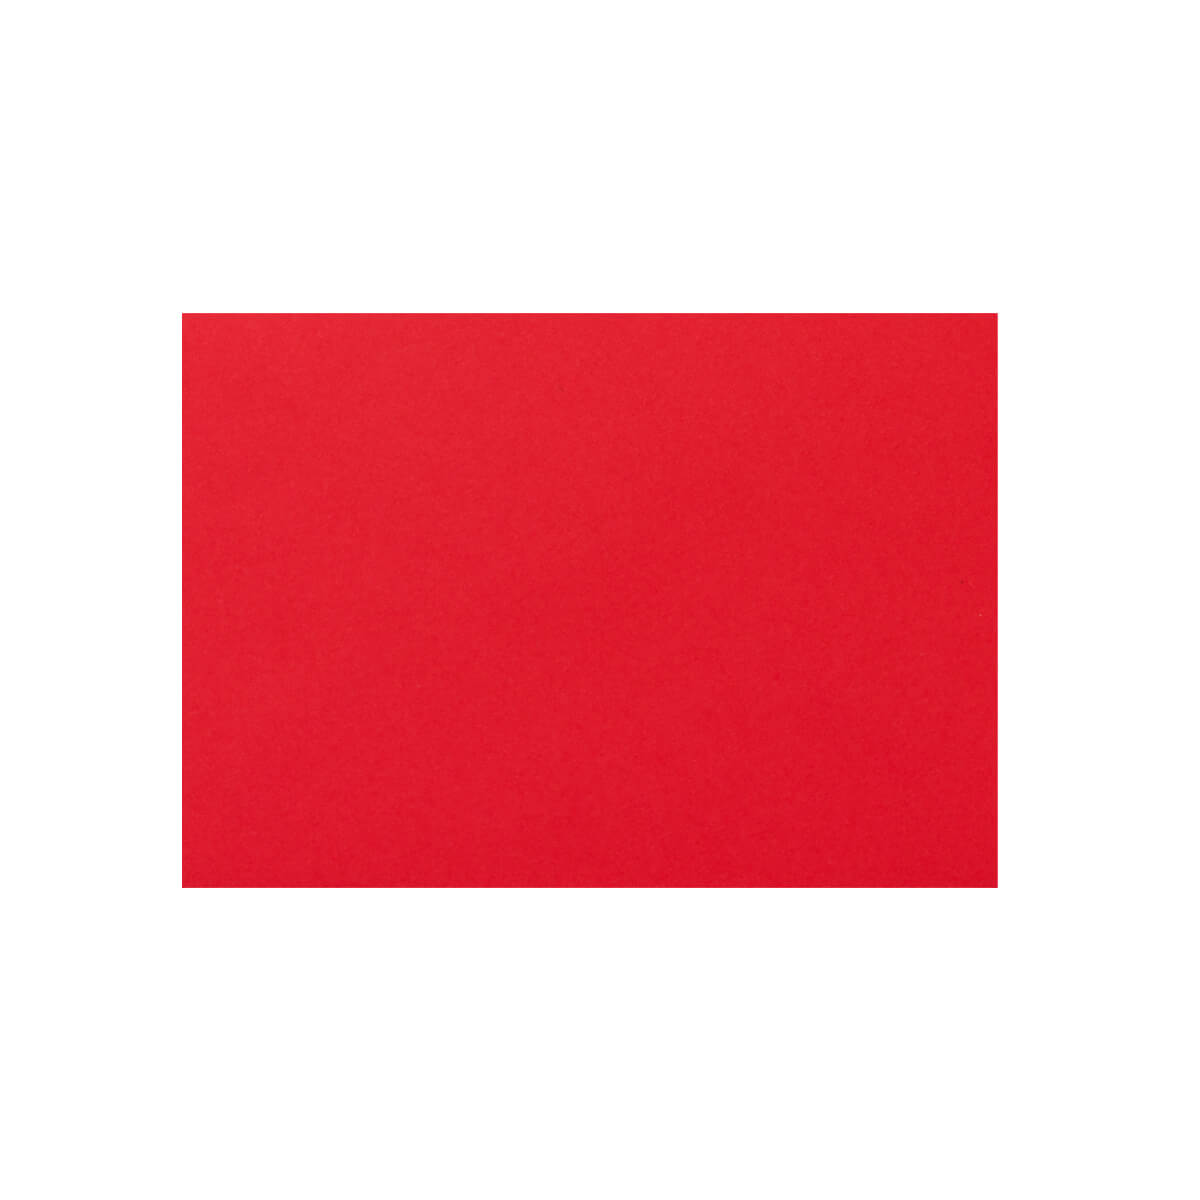 C7 BRIGHT RED ENVELOPES 120GSM